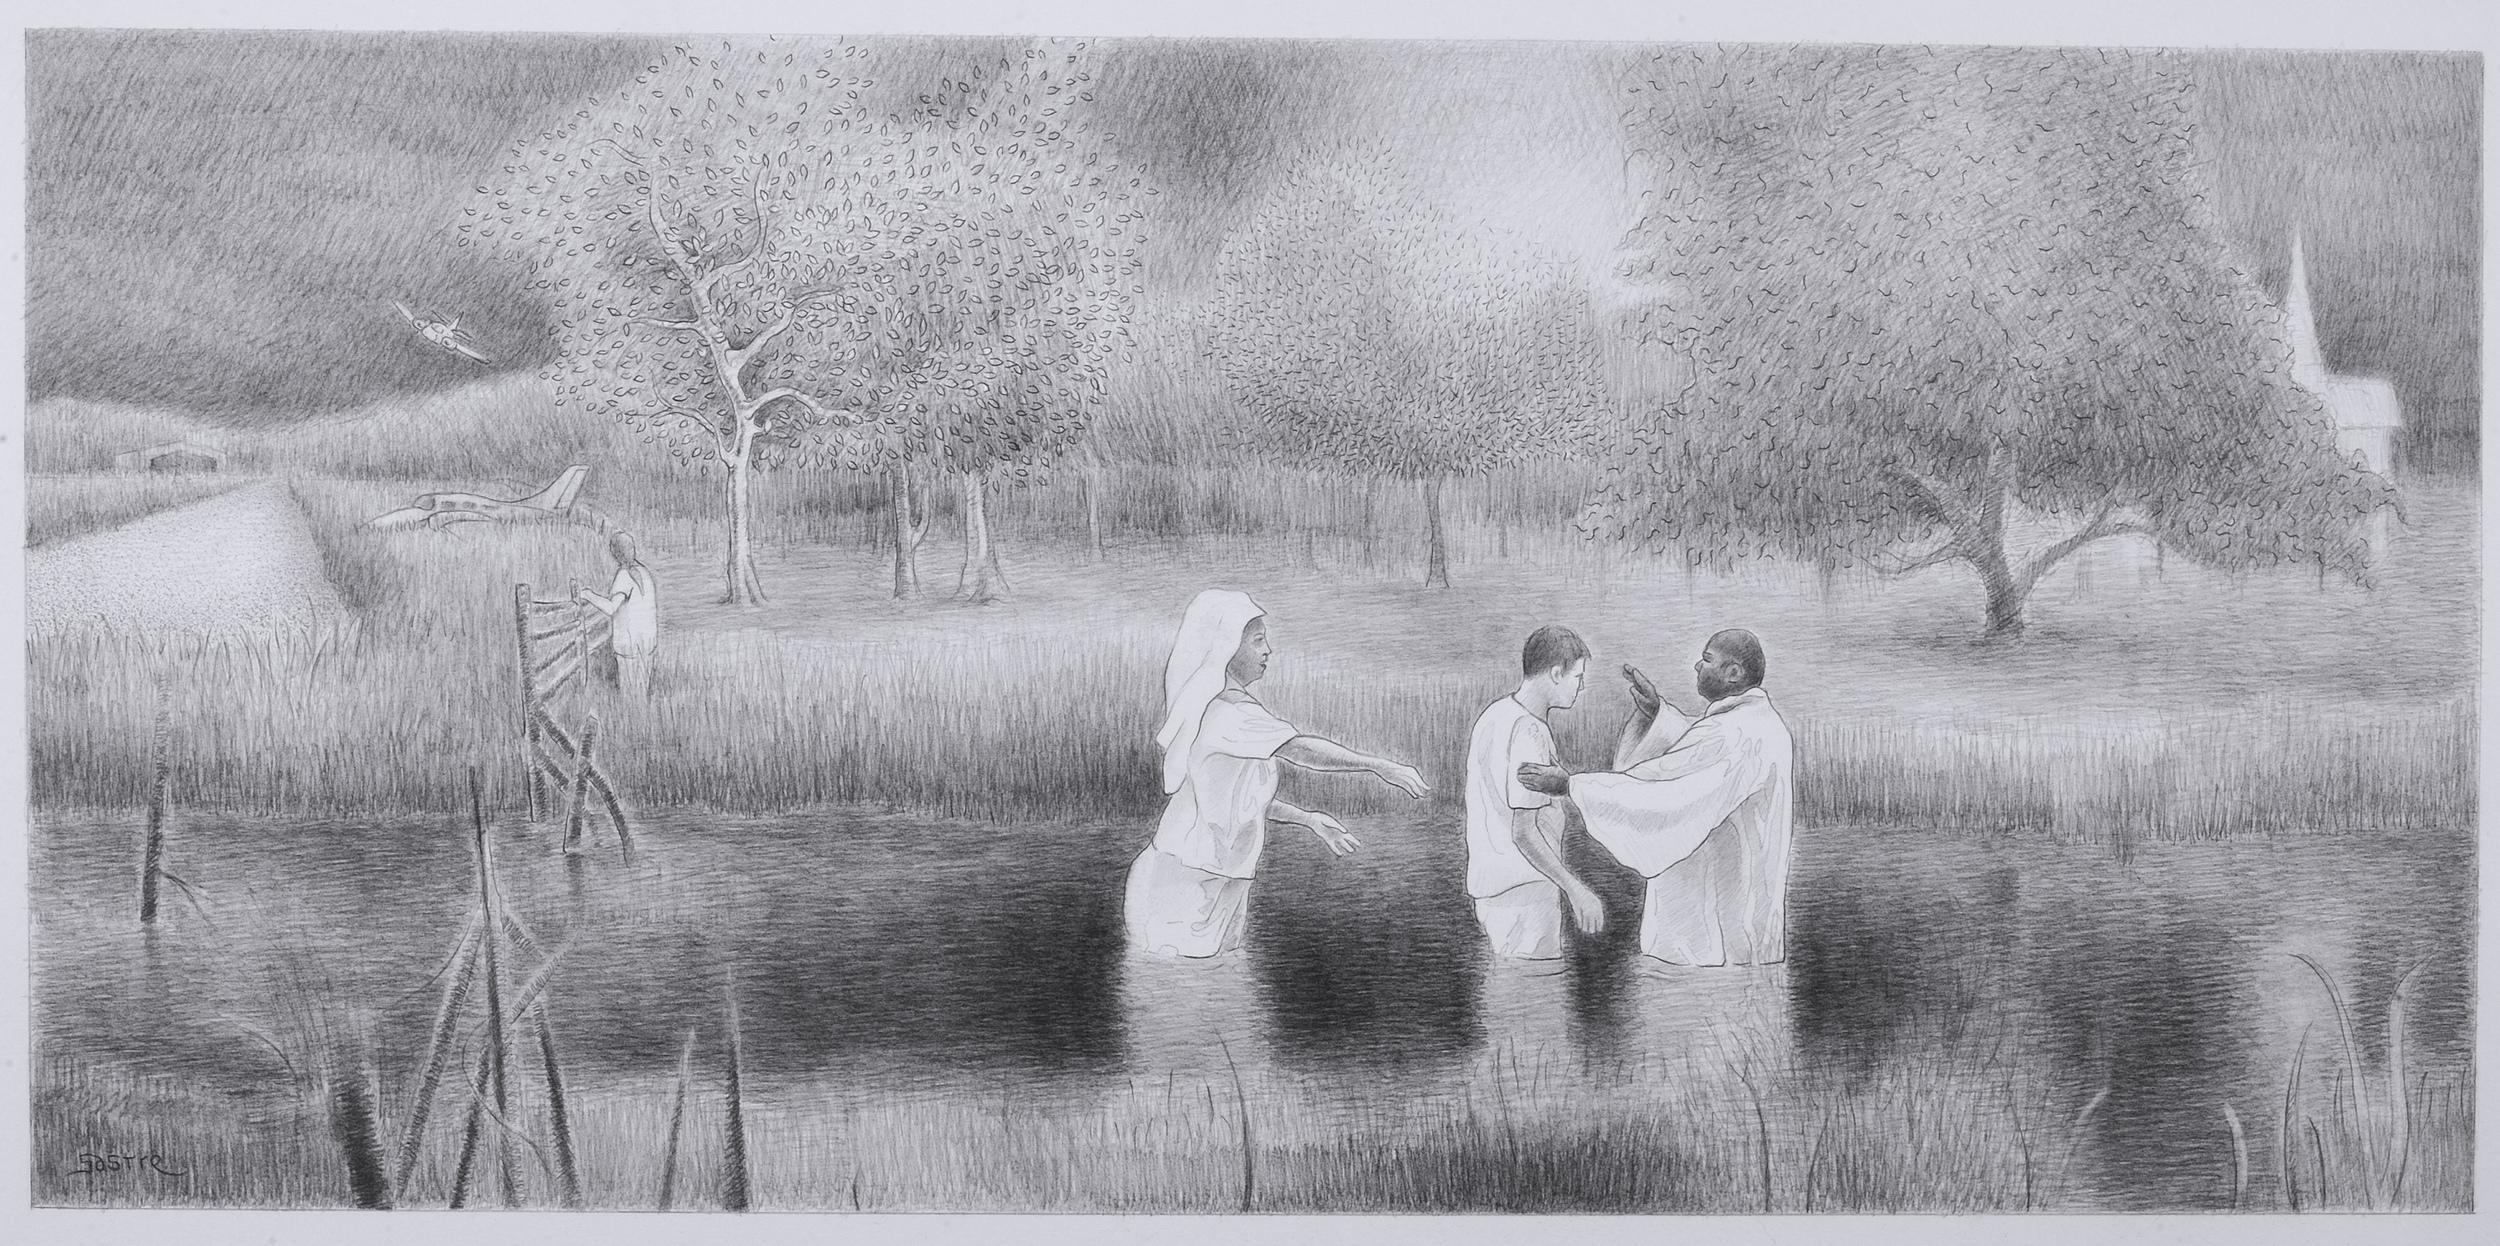 "<style>  P { font-size : 8pt } </style> River Baptism <br> 12x24"" <br> Graphite"